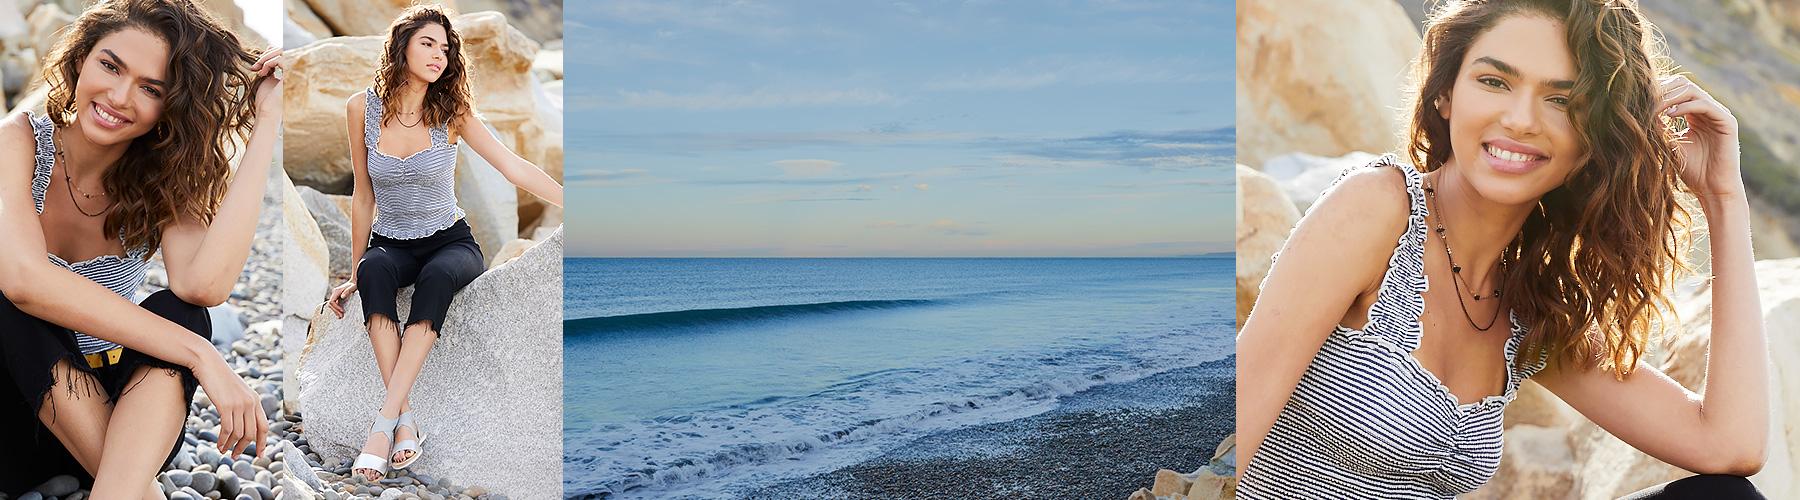 Smiling girl sitting on rocks by ocean wearing Billabong Sun Dreamer striped tank top and black jeans.